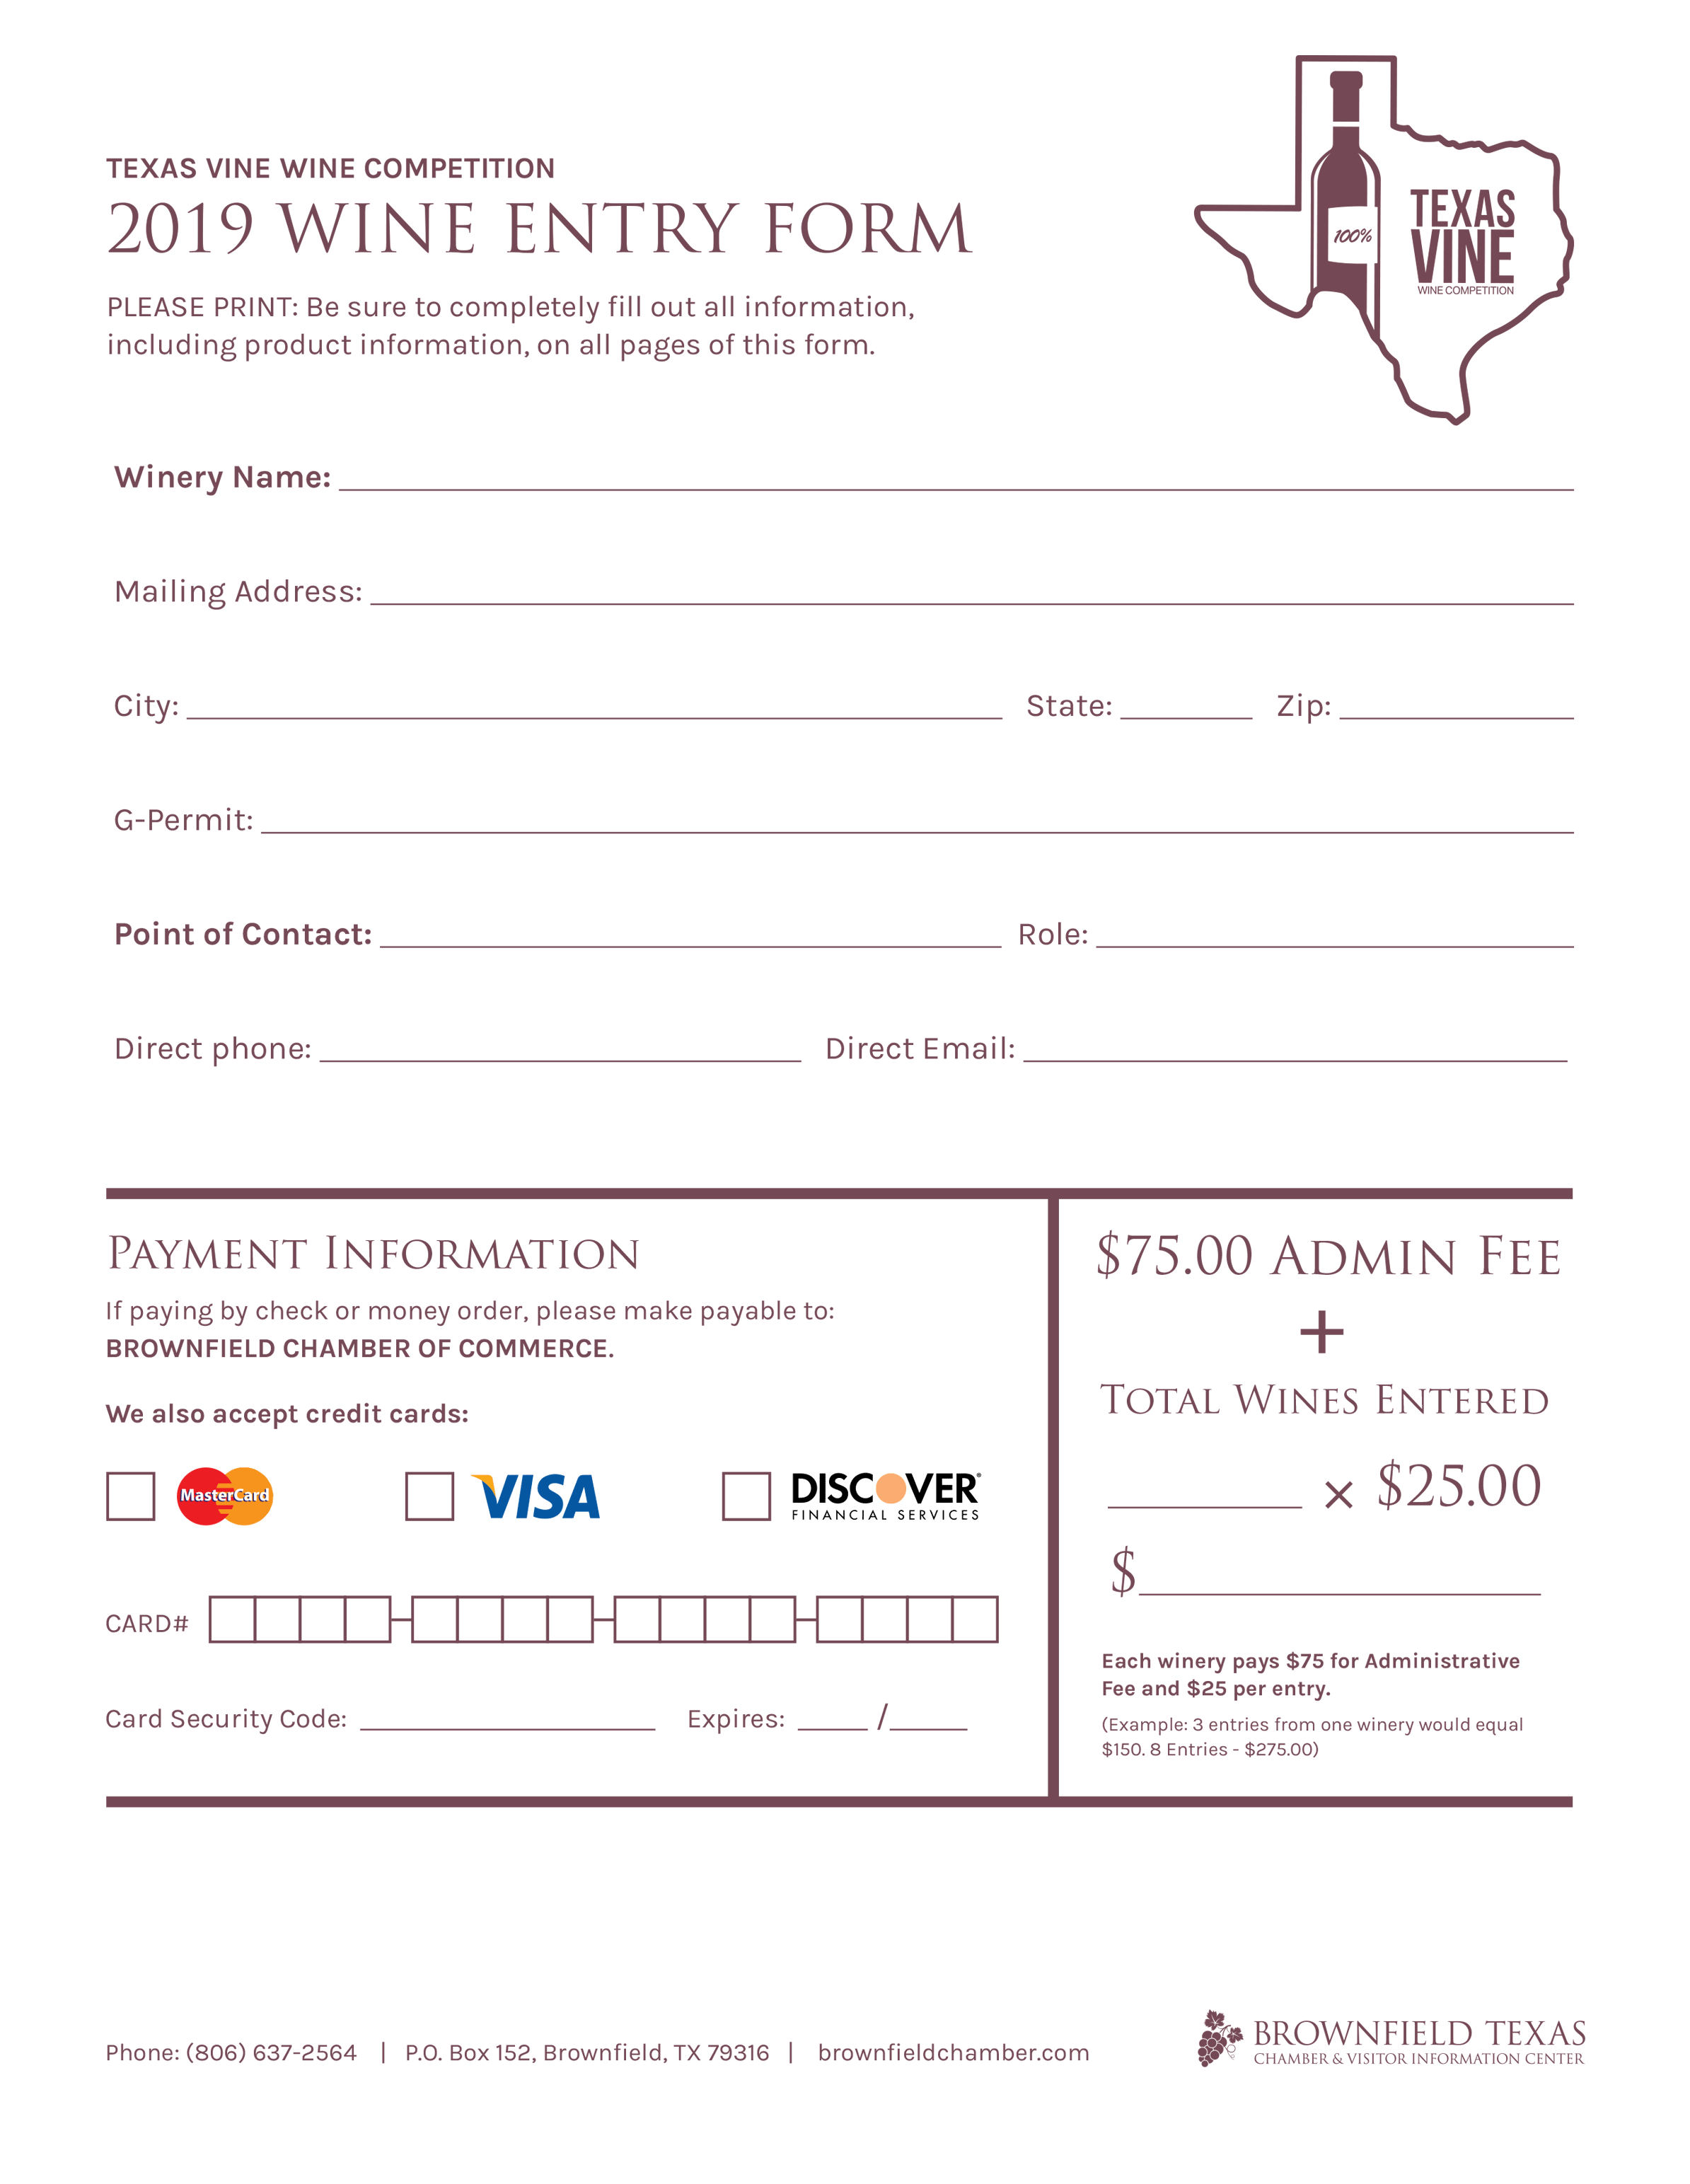 TExas Vine Festival Entry form